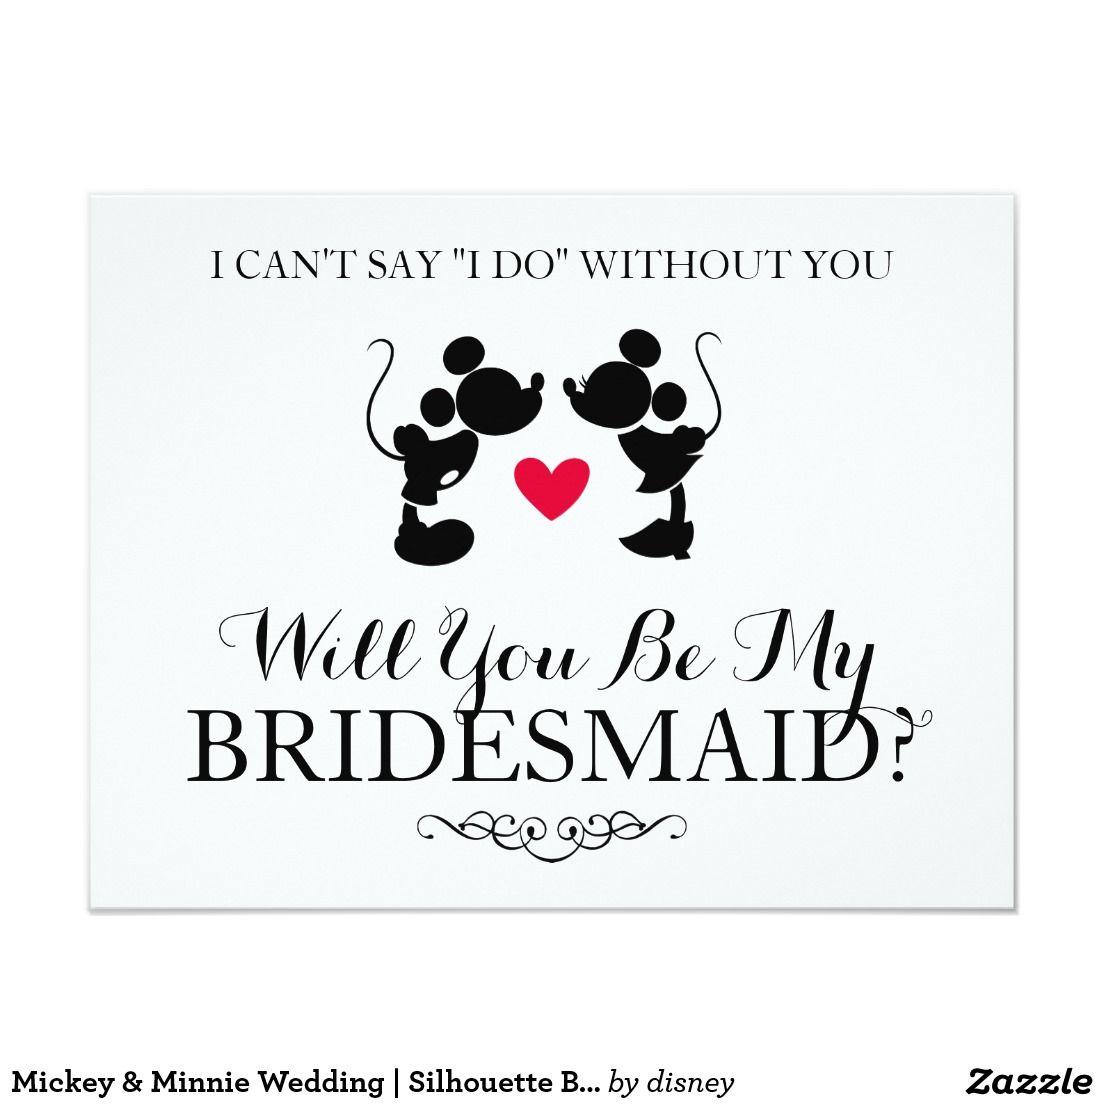 Mickey & Minnie Wedding | Silhouette Bridesmaid | WEDDING: WILL YOU ...